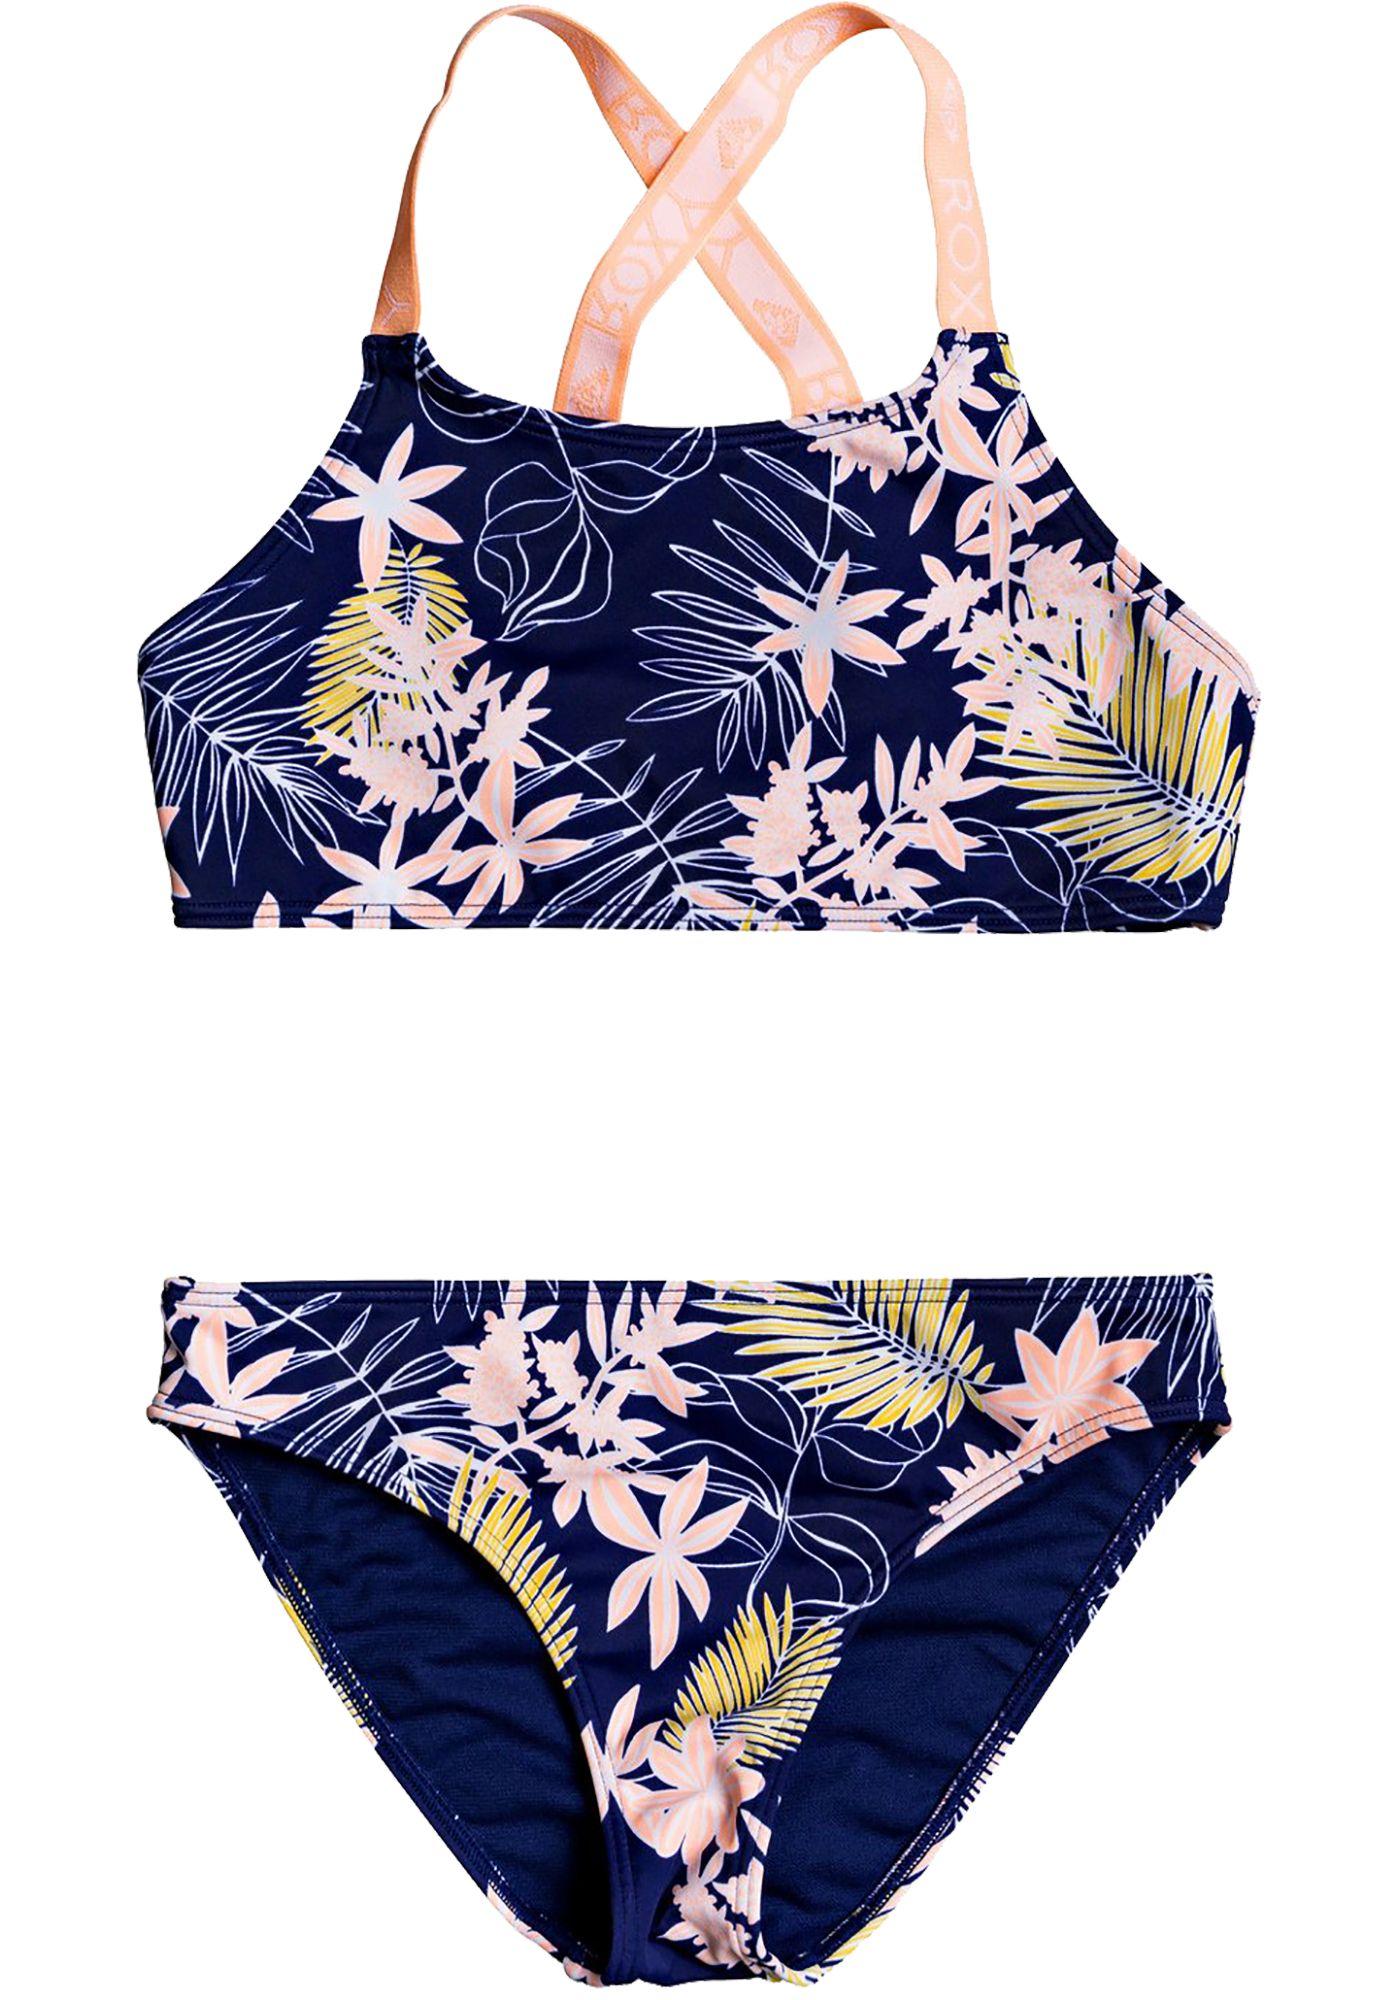 Roxy Girls' Bikini Point Crop Top Set